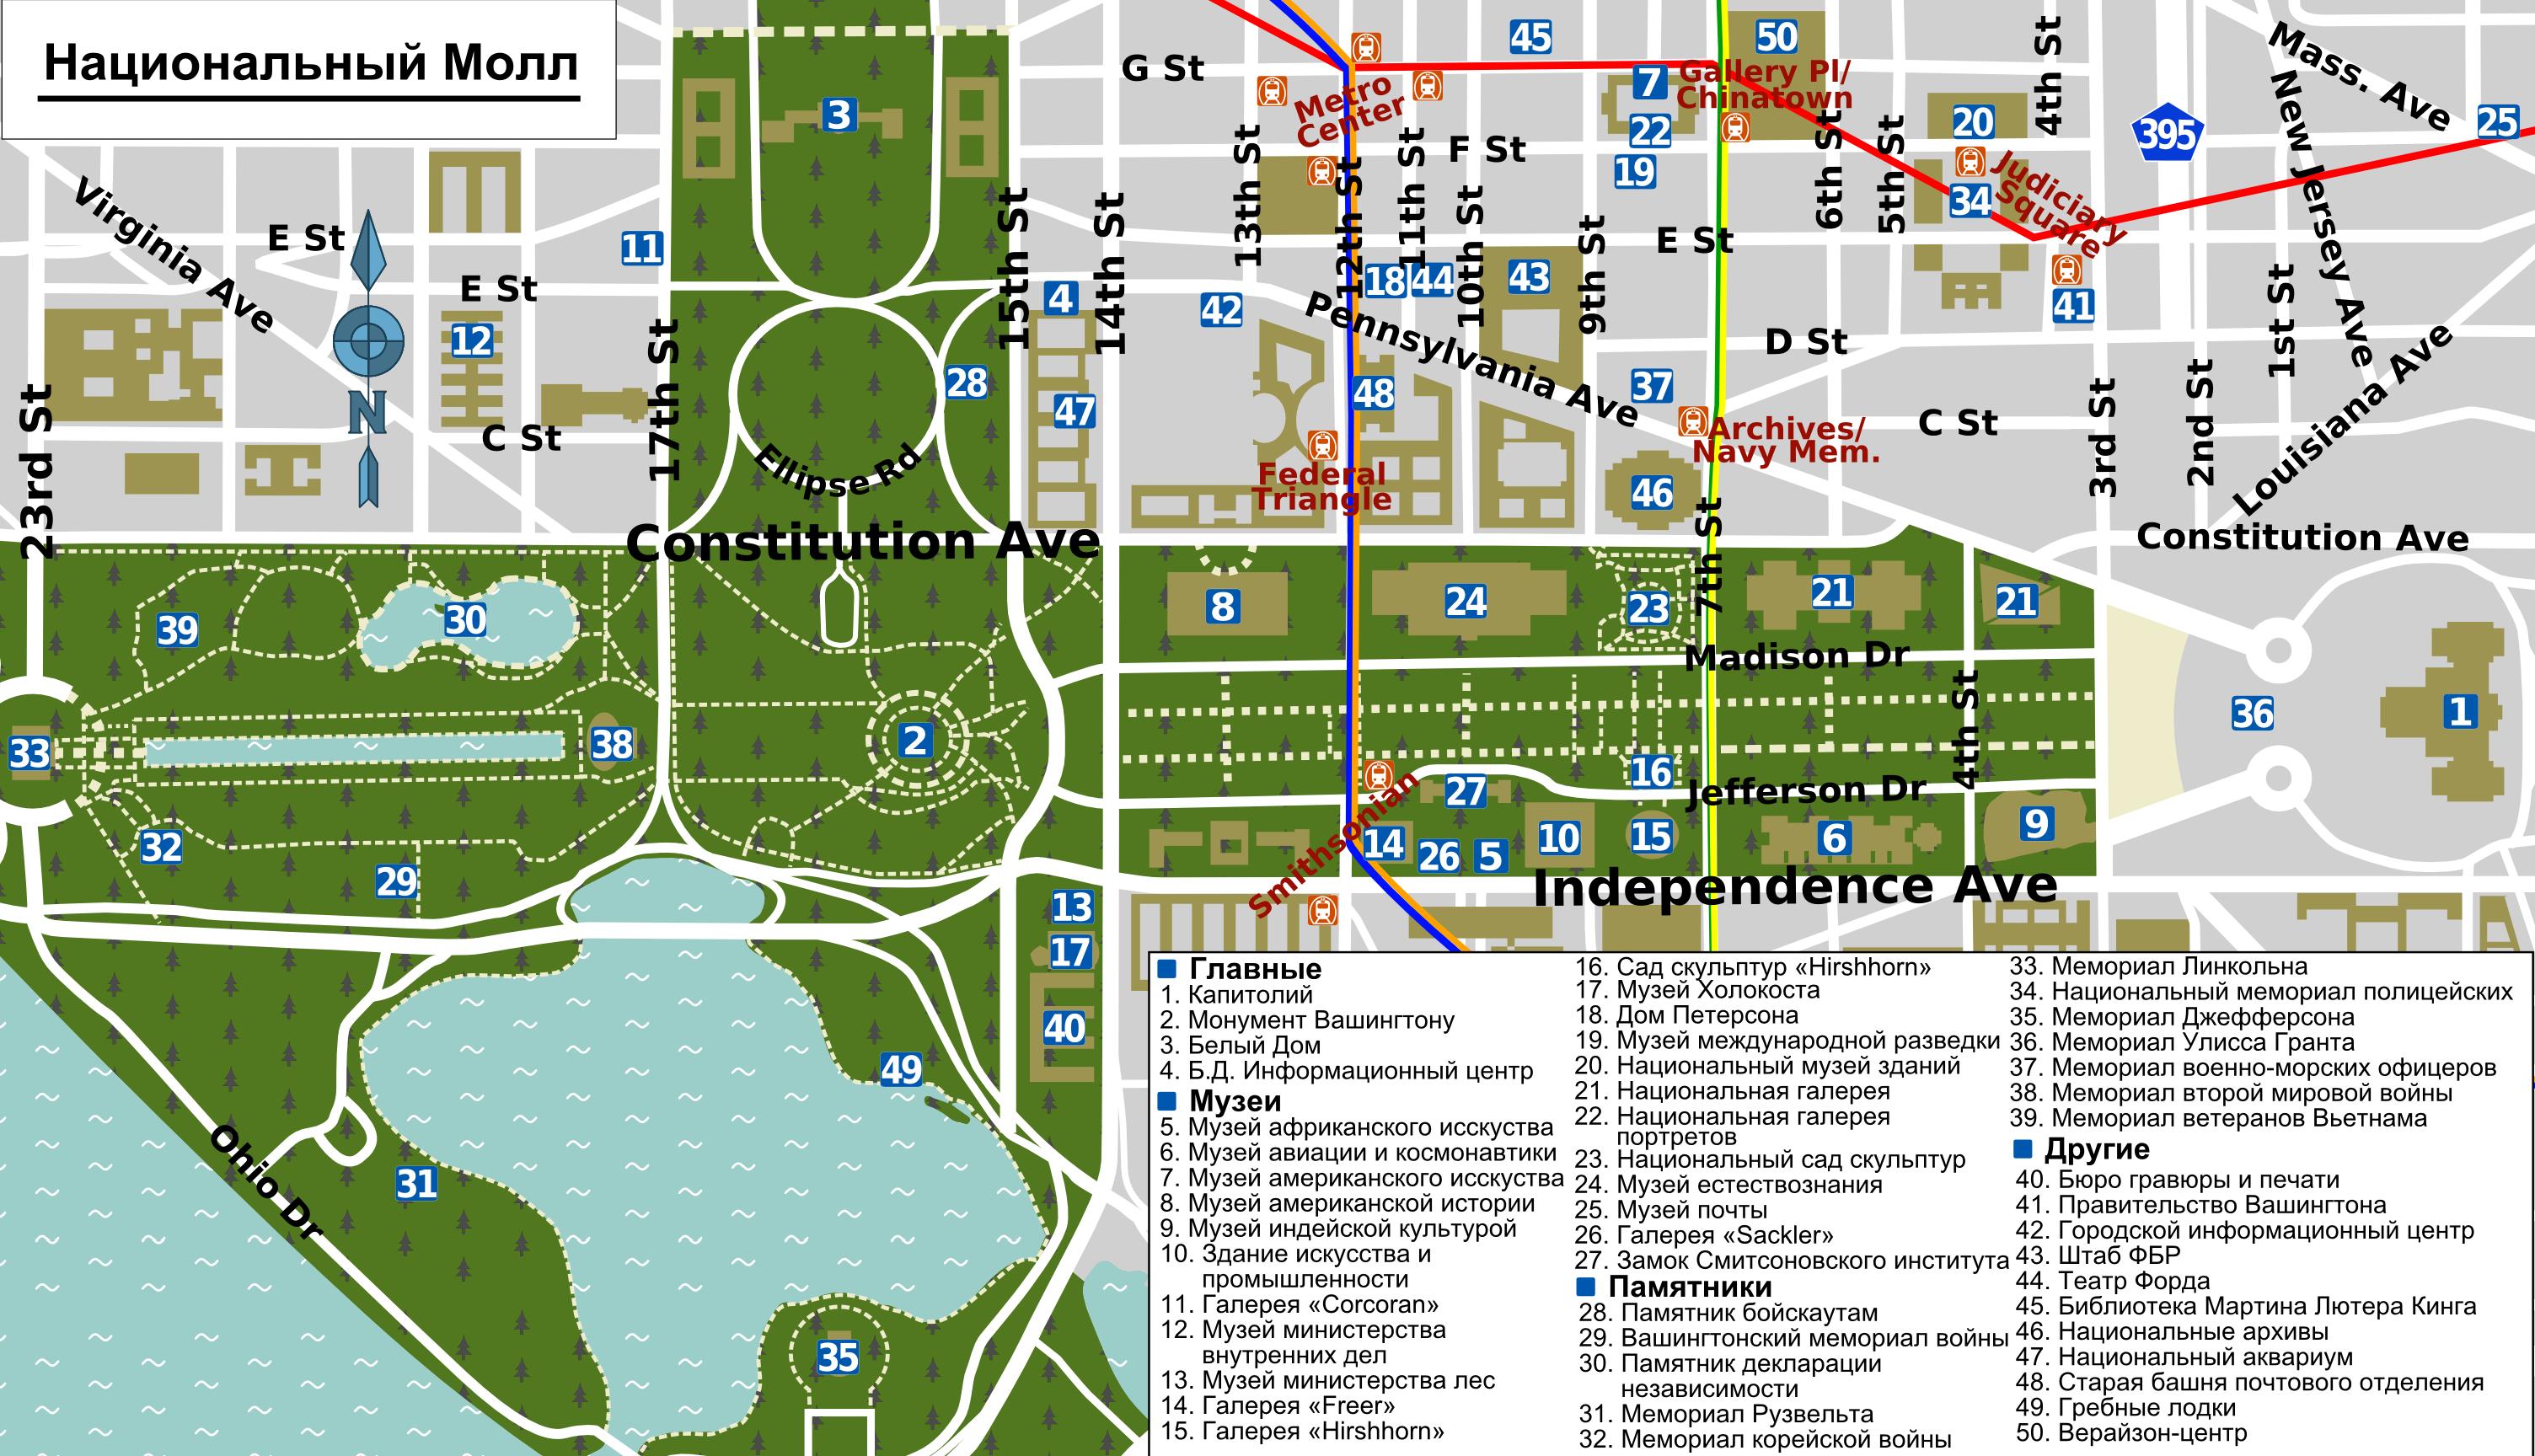 FileNational Mall Map Rupng  Wikimedia Commons